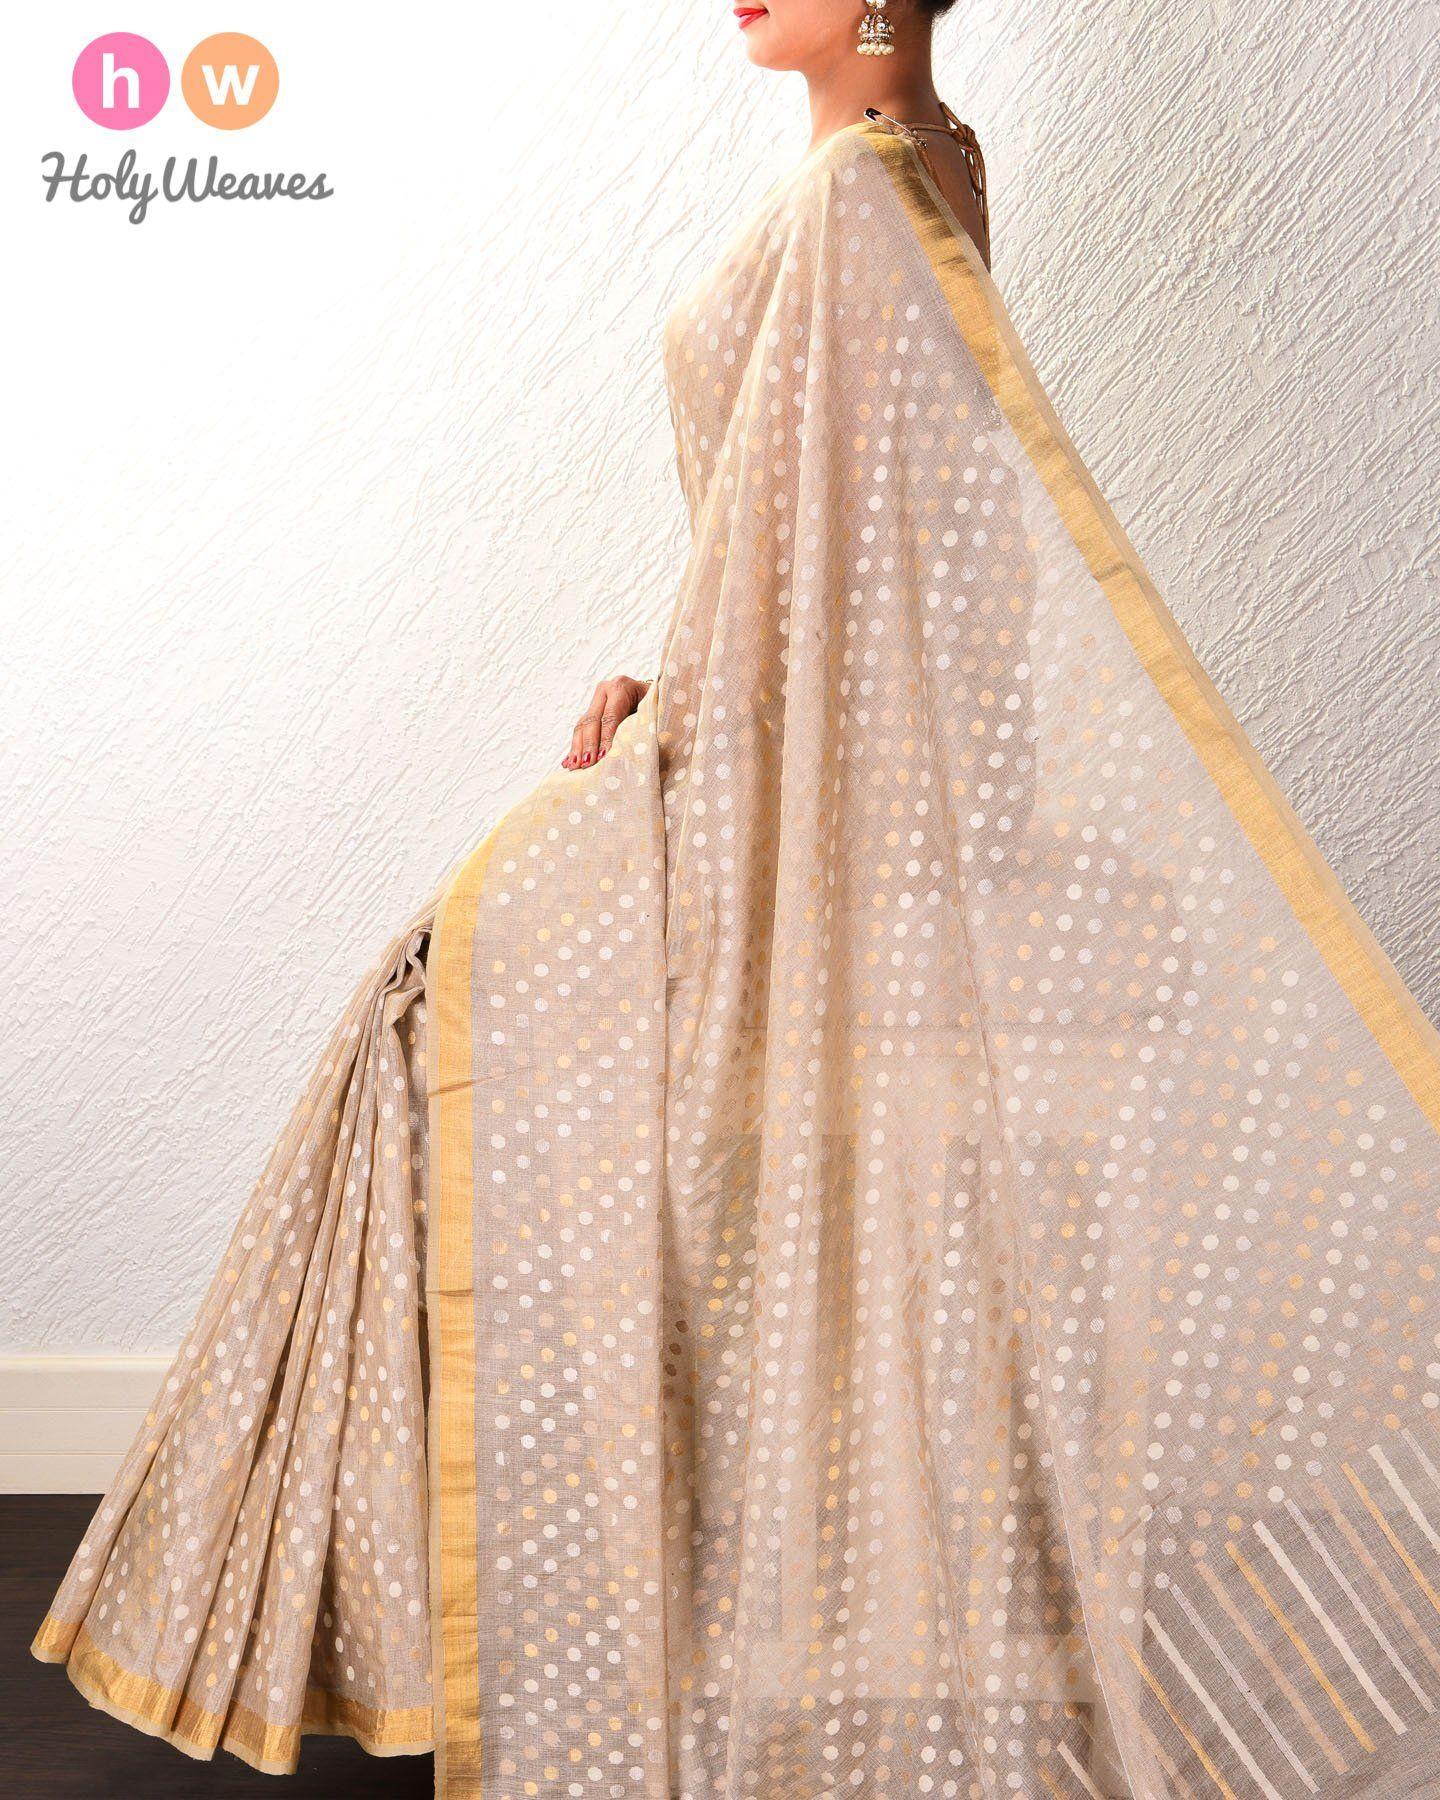 Golden Beige Ghani 35-Sirki Sona Rupa Polka Buti Kadhuan Brocade Handwoven Tasar Muga Tissue Saree  #Saree #Handwoven #Brocade #Kashi #Varanasi #Banaras #India #Sari #Handloom